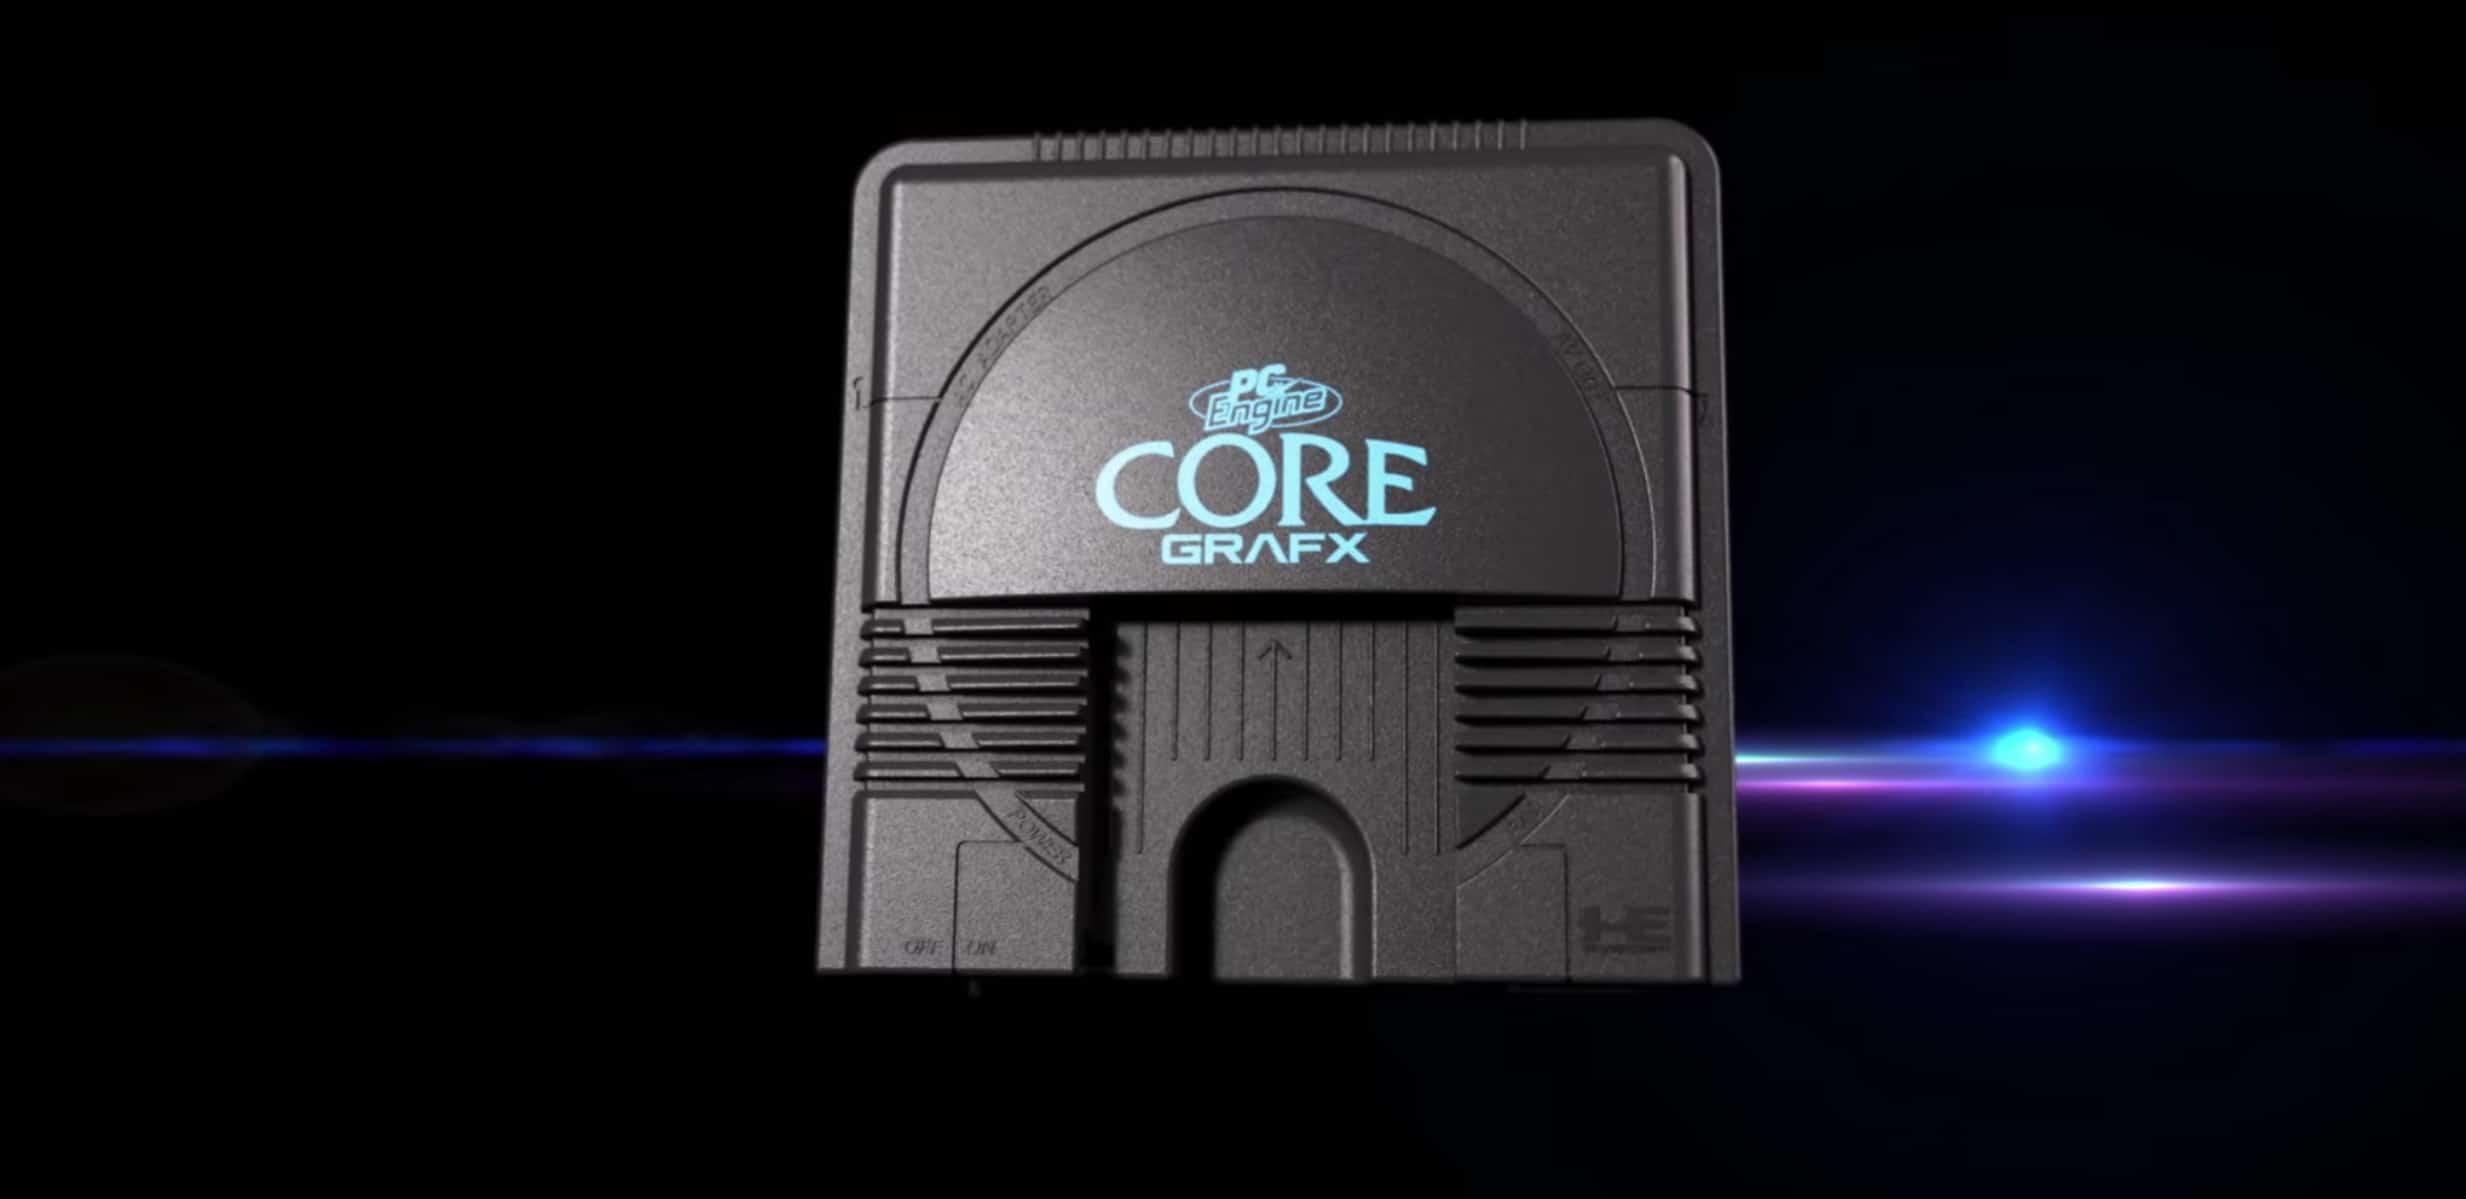 PC Engine Core Grafx Mini: Japan-Kult als Schrumpfkonsole